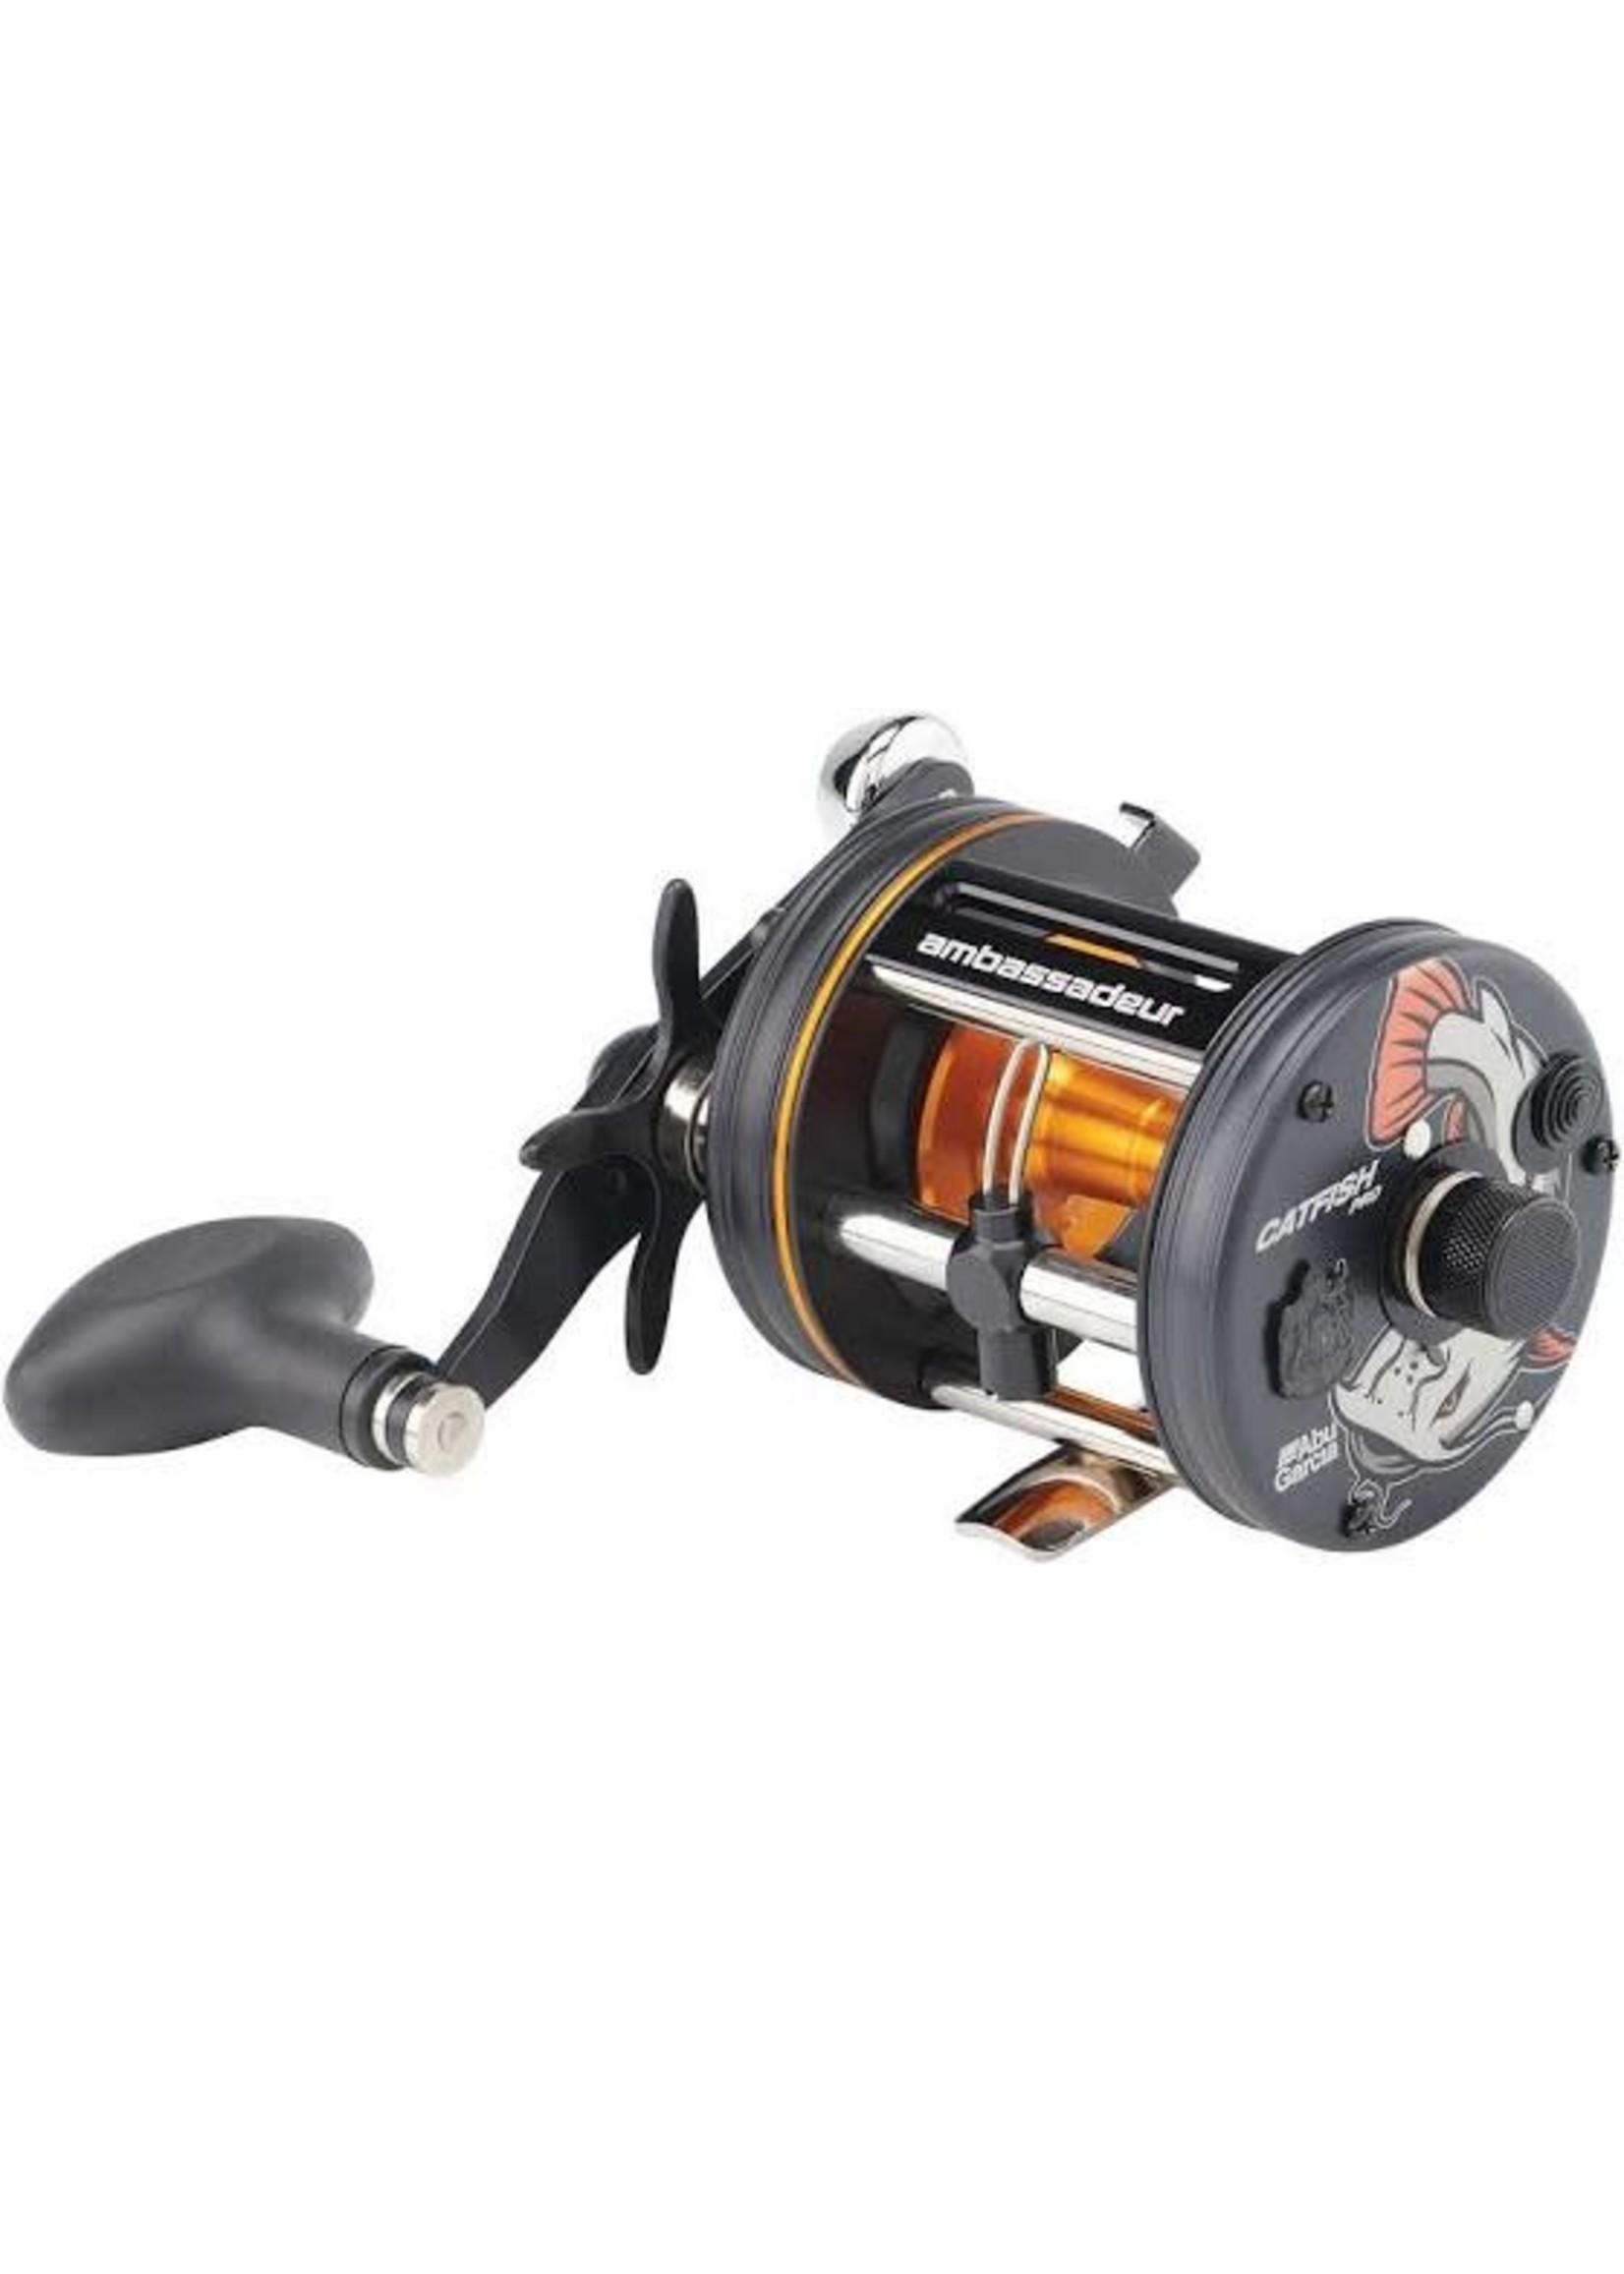 Abu Garcia Abu Garcia C3 6500 Reel Catfish Pro